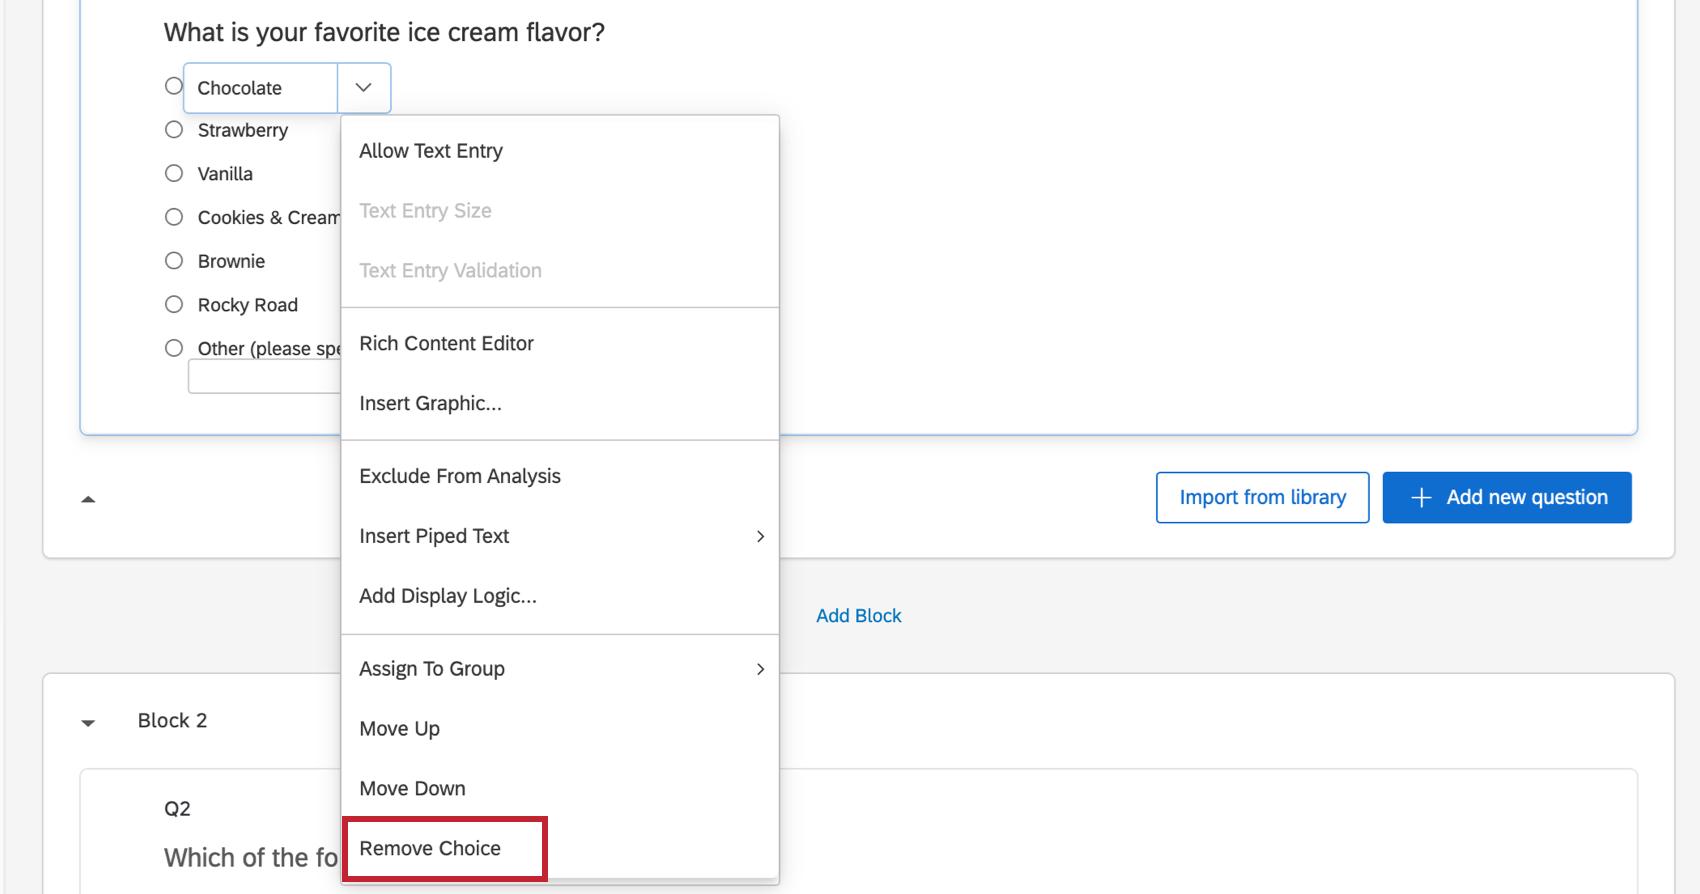 Last option in the menu the blue arrow opens